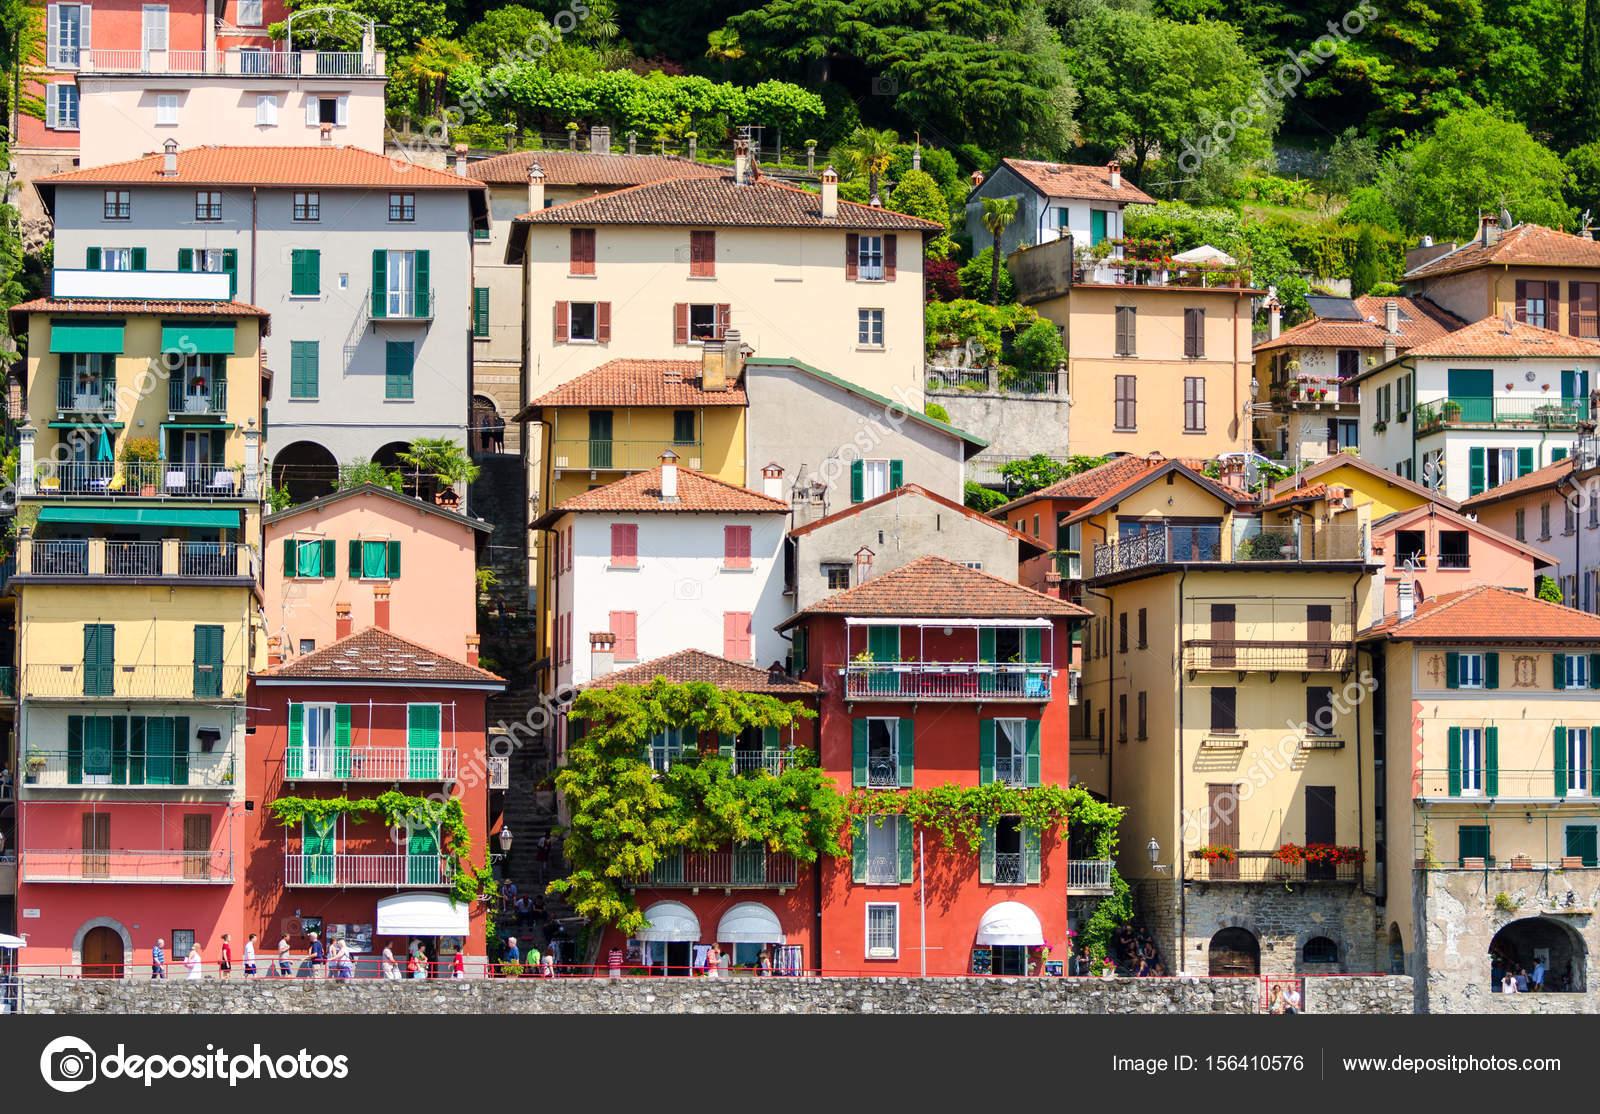 Häuser Italien bunten häuser in der stadt varenna am comer see italien stockfoto